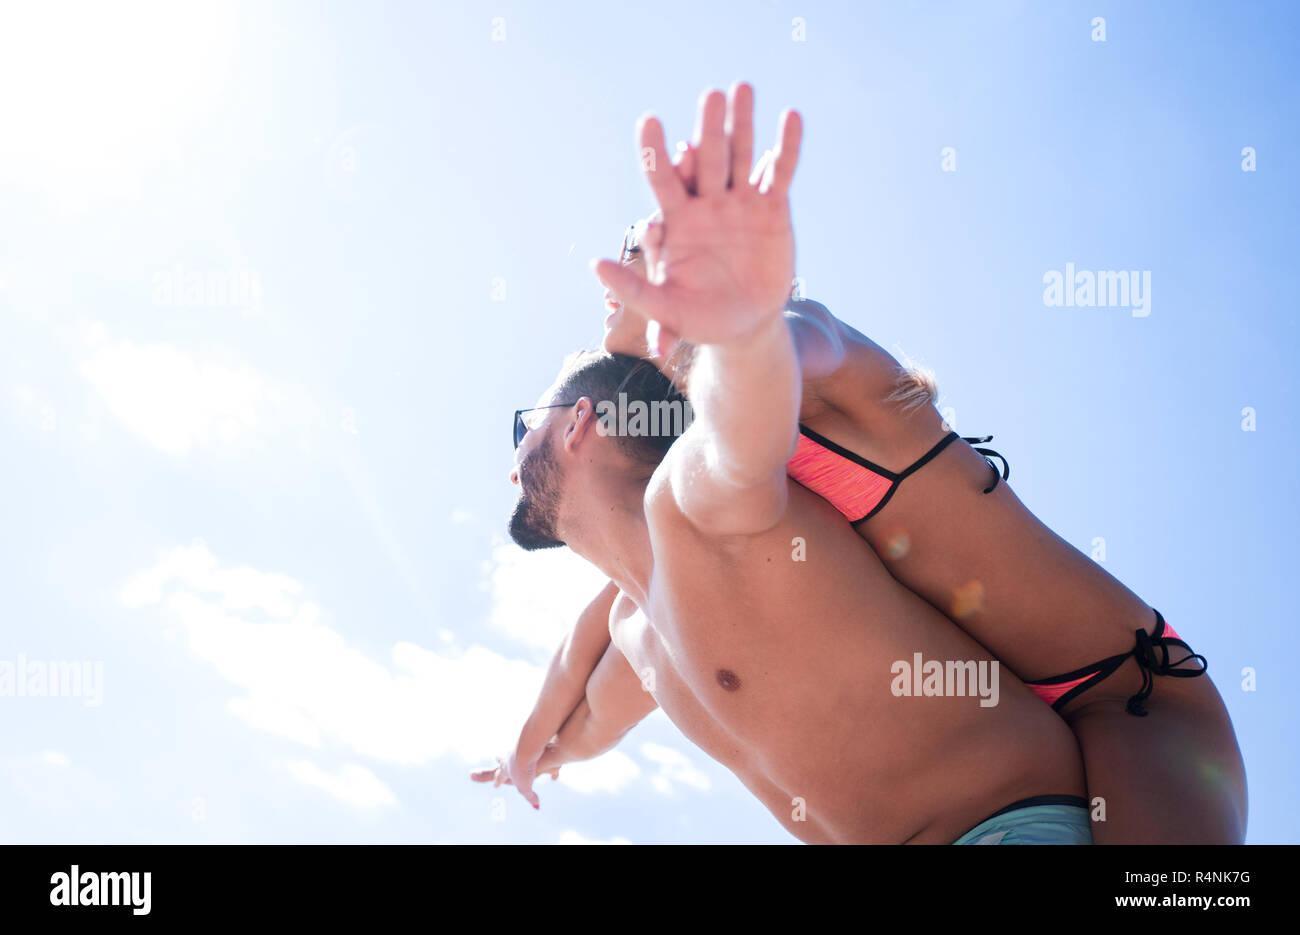 Man carrying woman piggyback on beach. - Stock Image